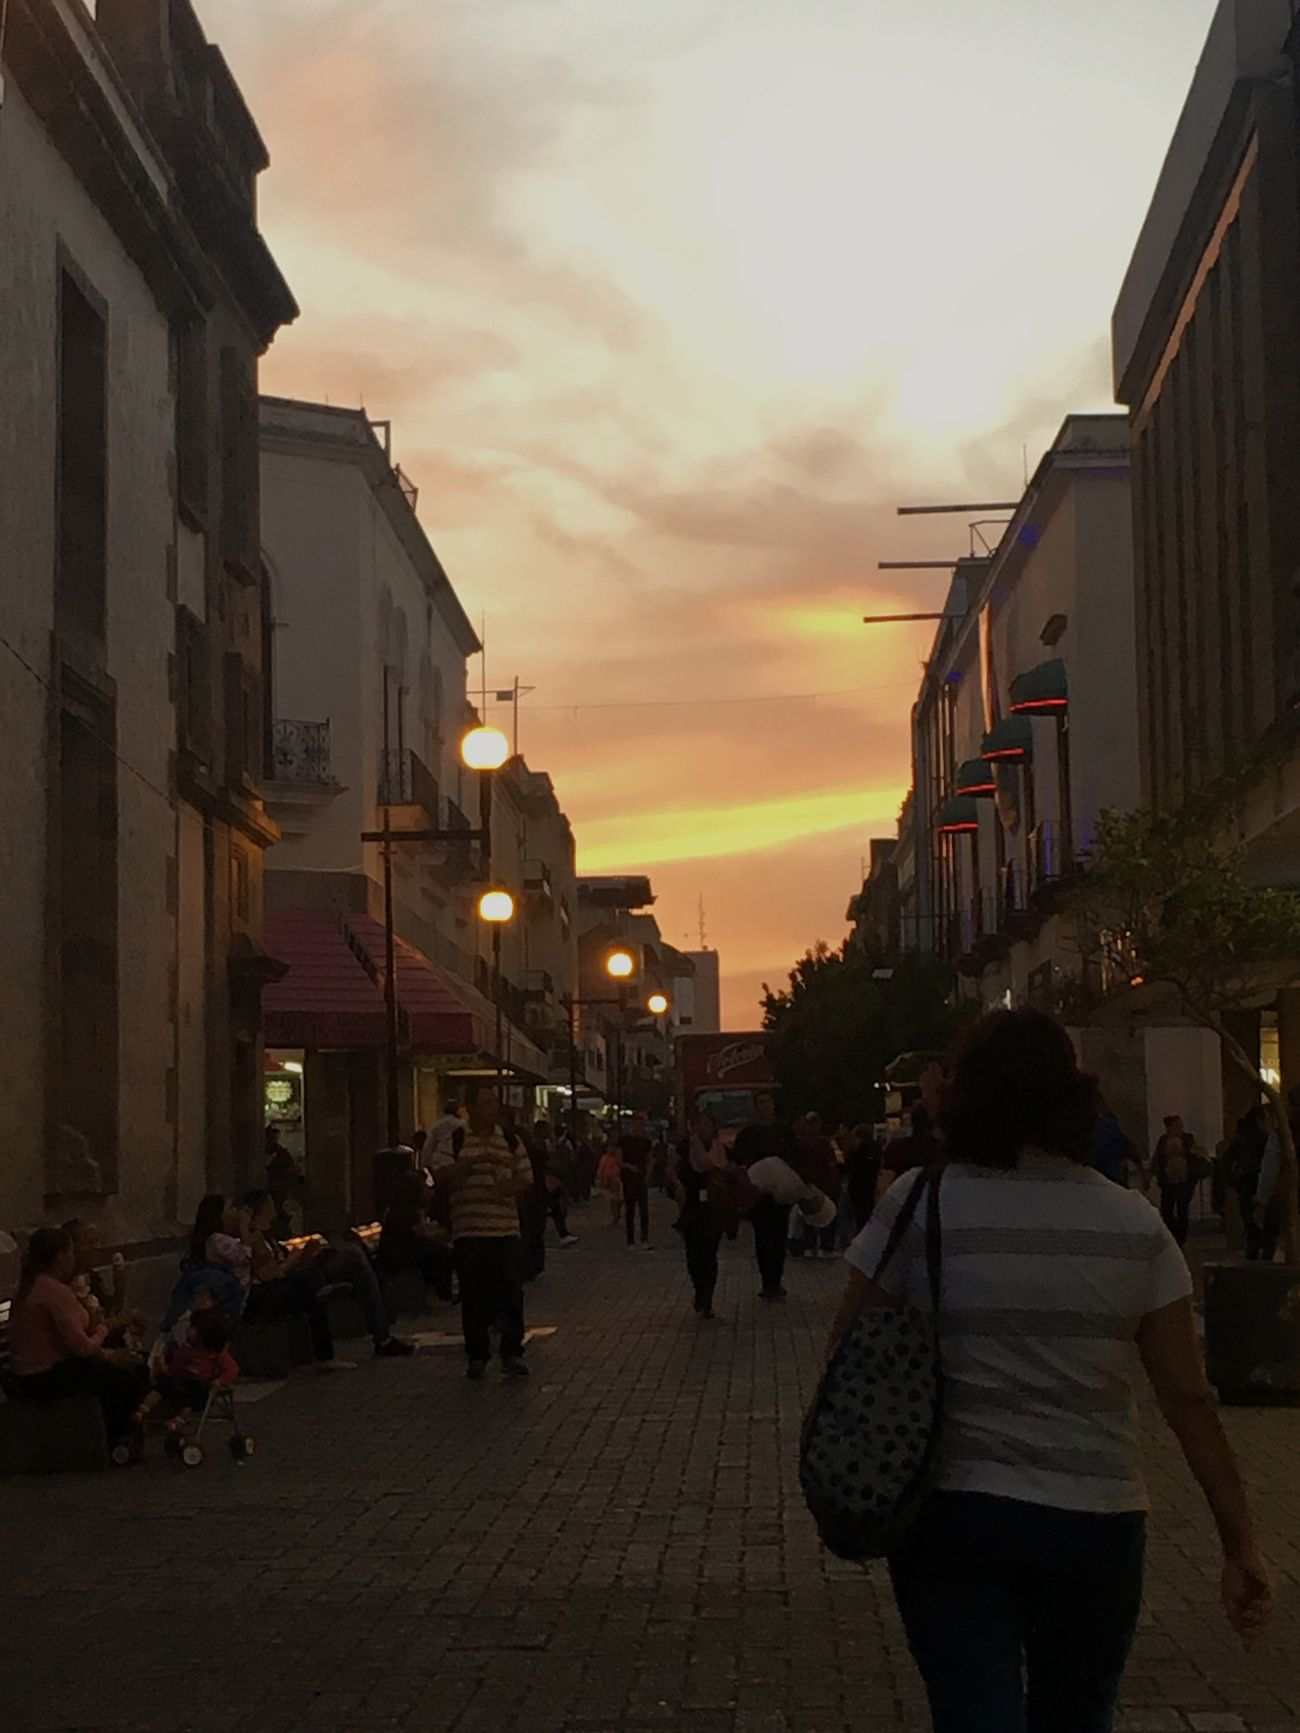 Disfrutando De La Vida Architecture Street Sky Sunset City Walking